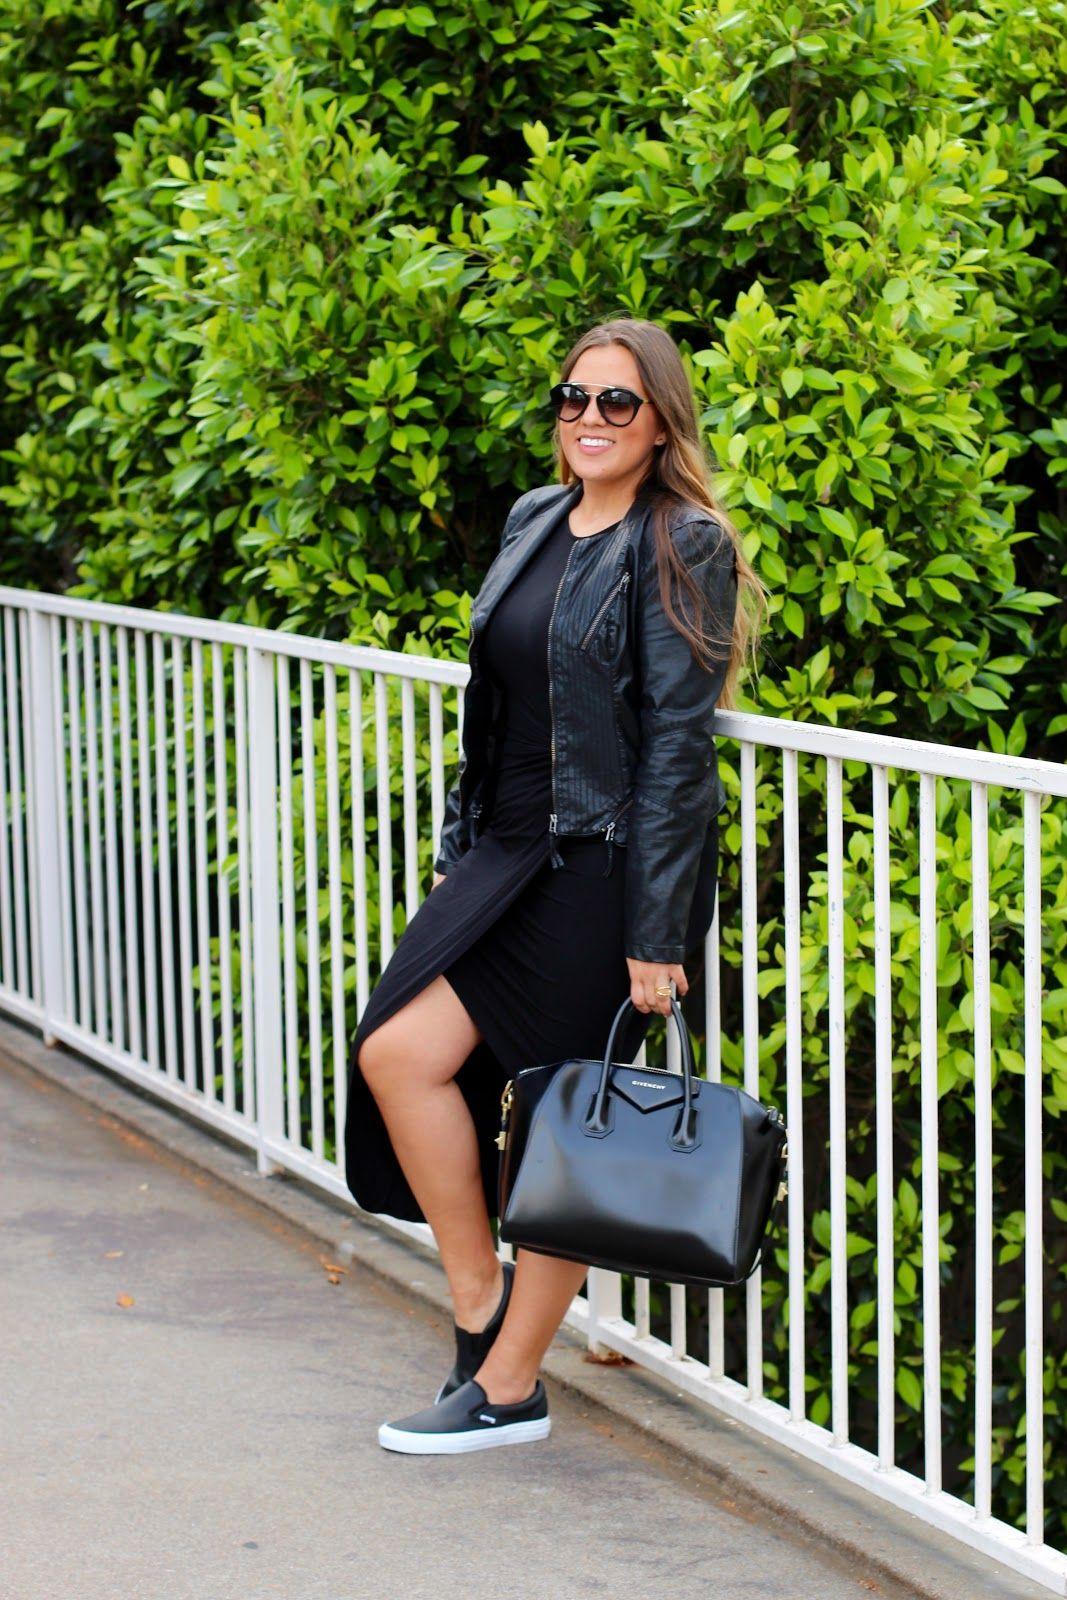 Van slip ons with ASTR dress and BlankNYC leather jacket